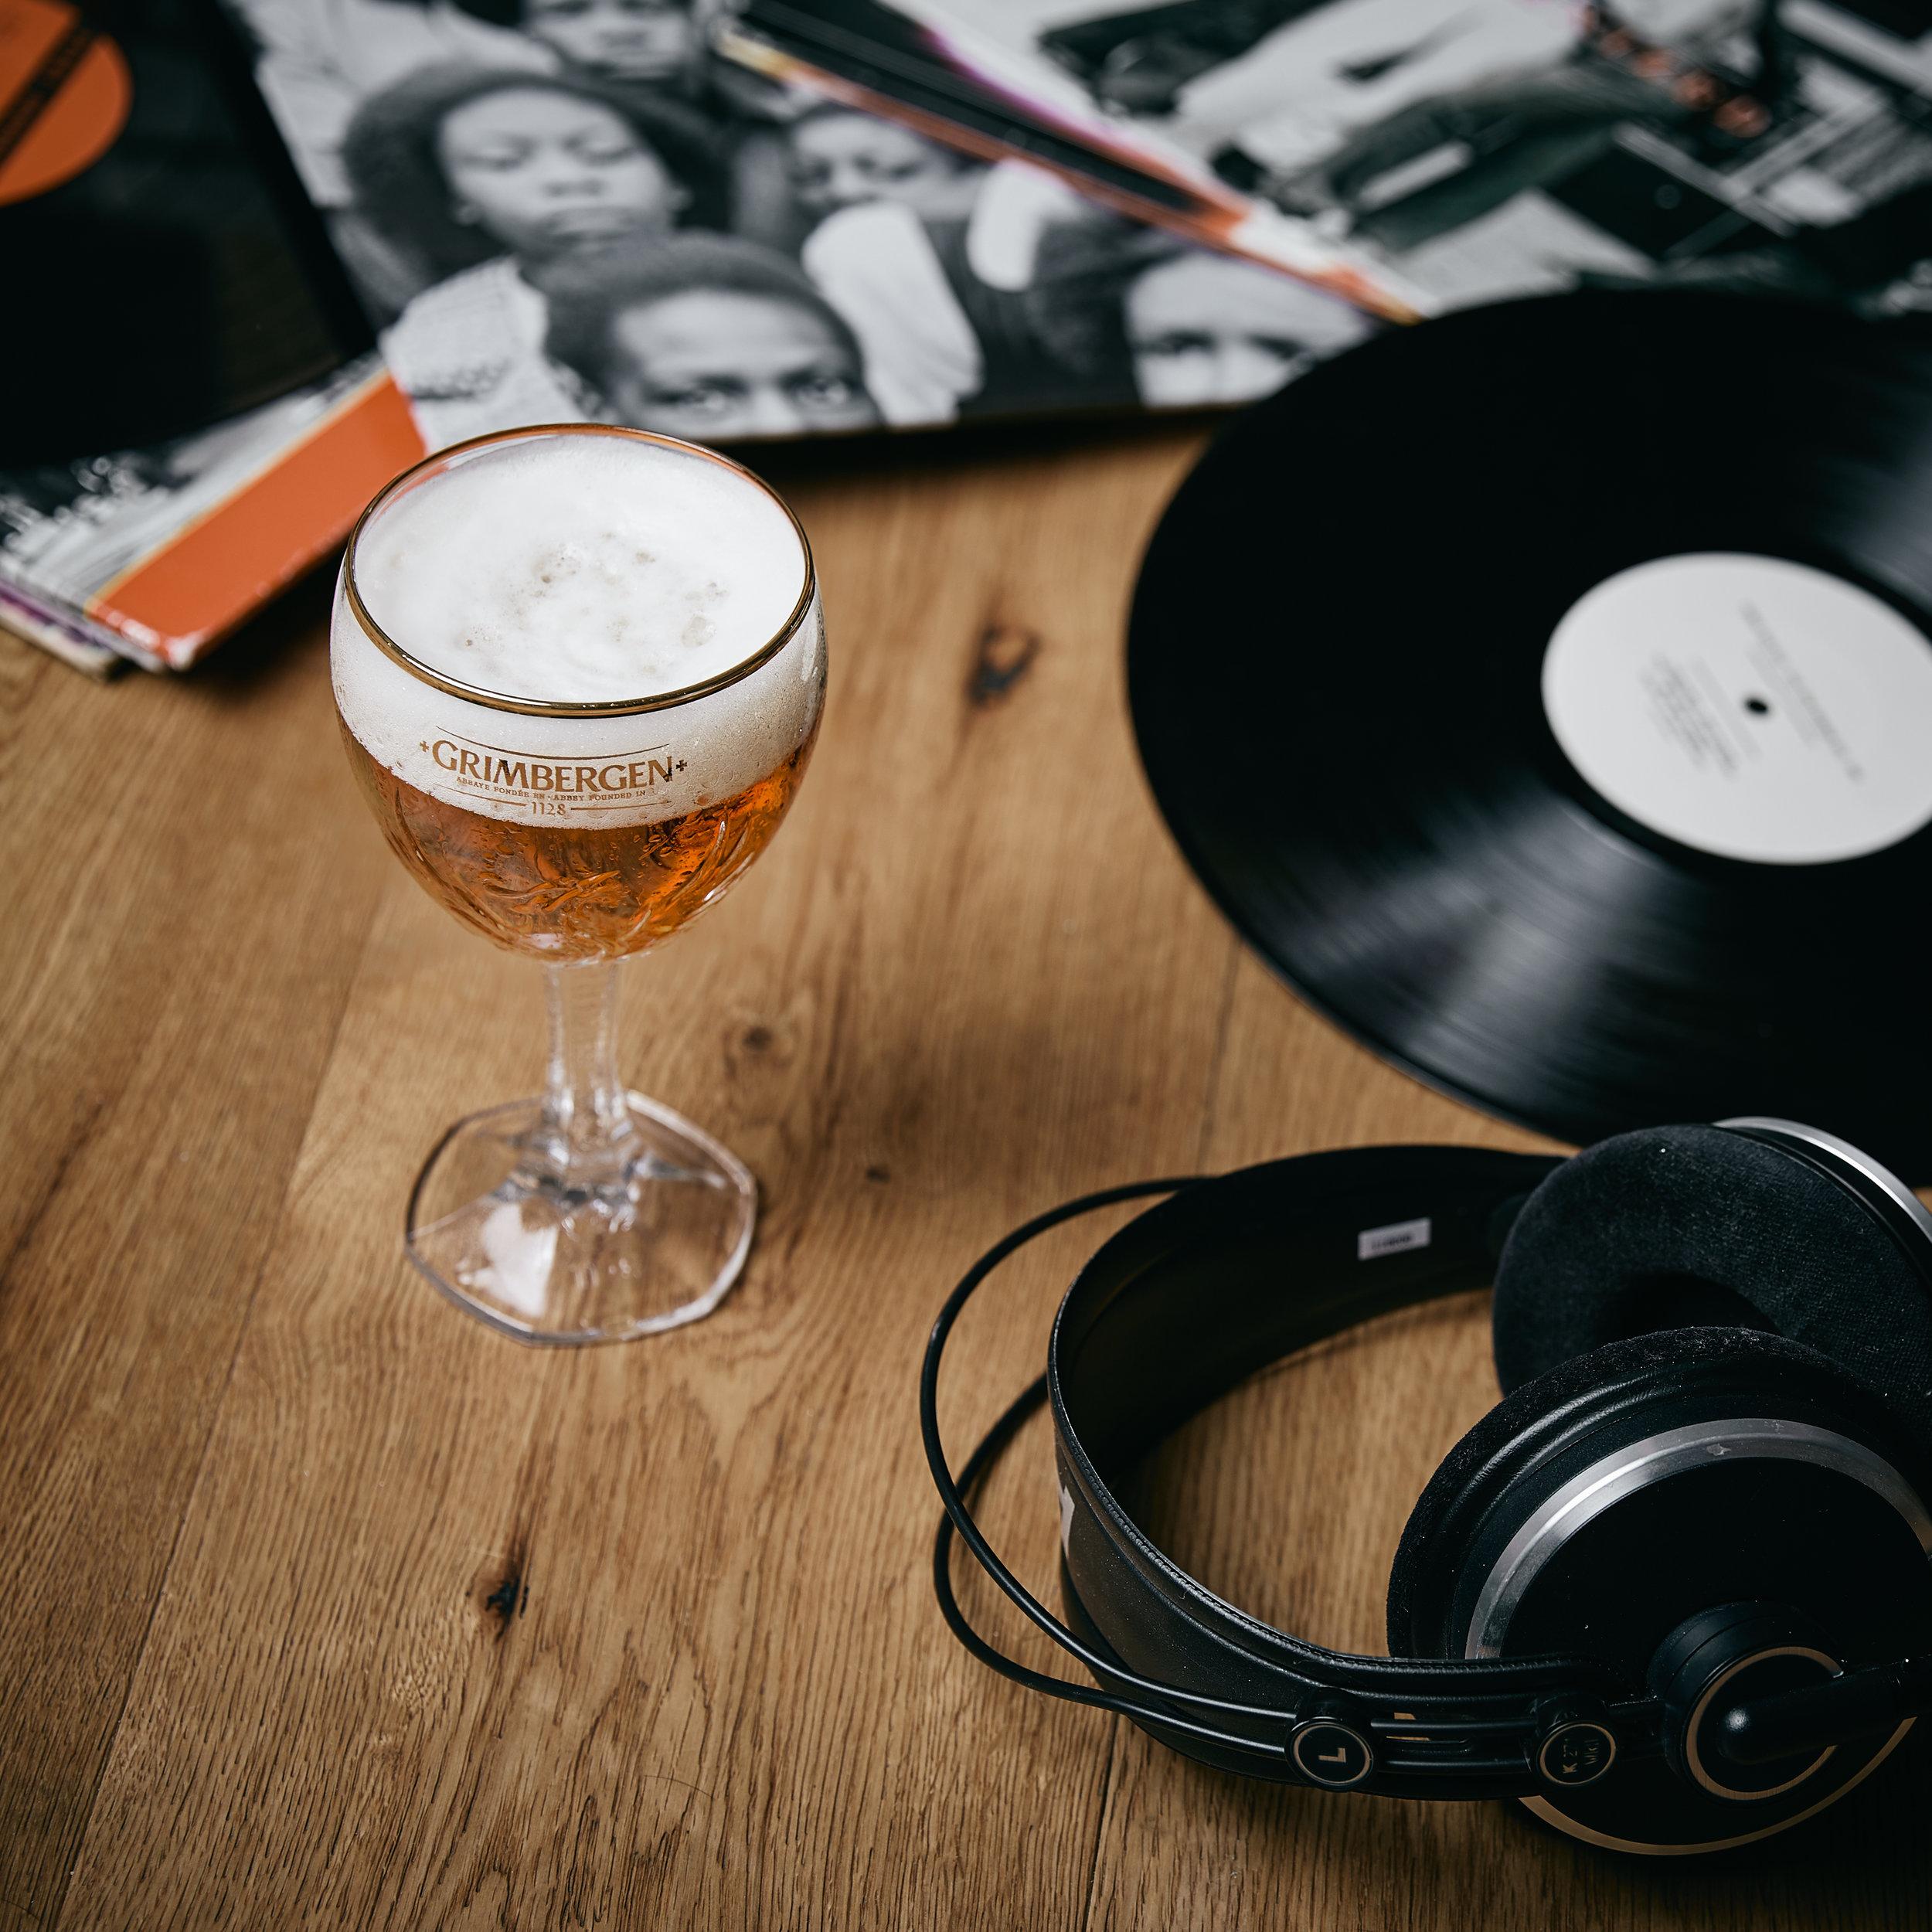 HOME_Vinyl_Blonde_Grimbergen_Home0079.jpg